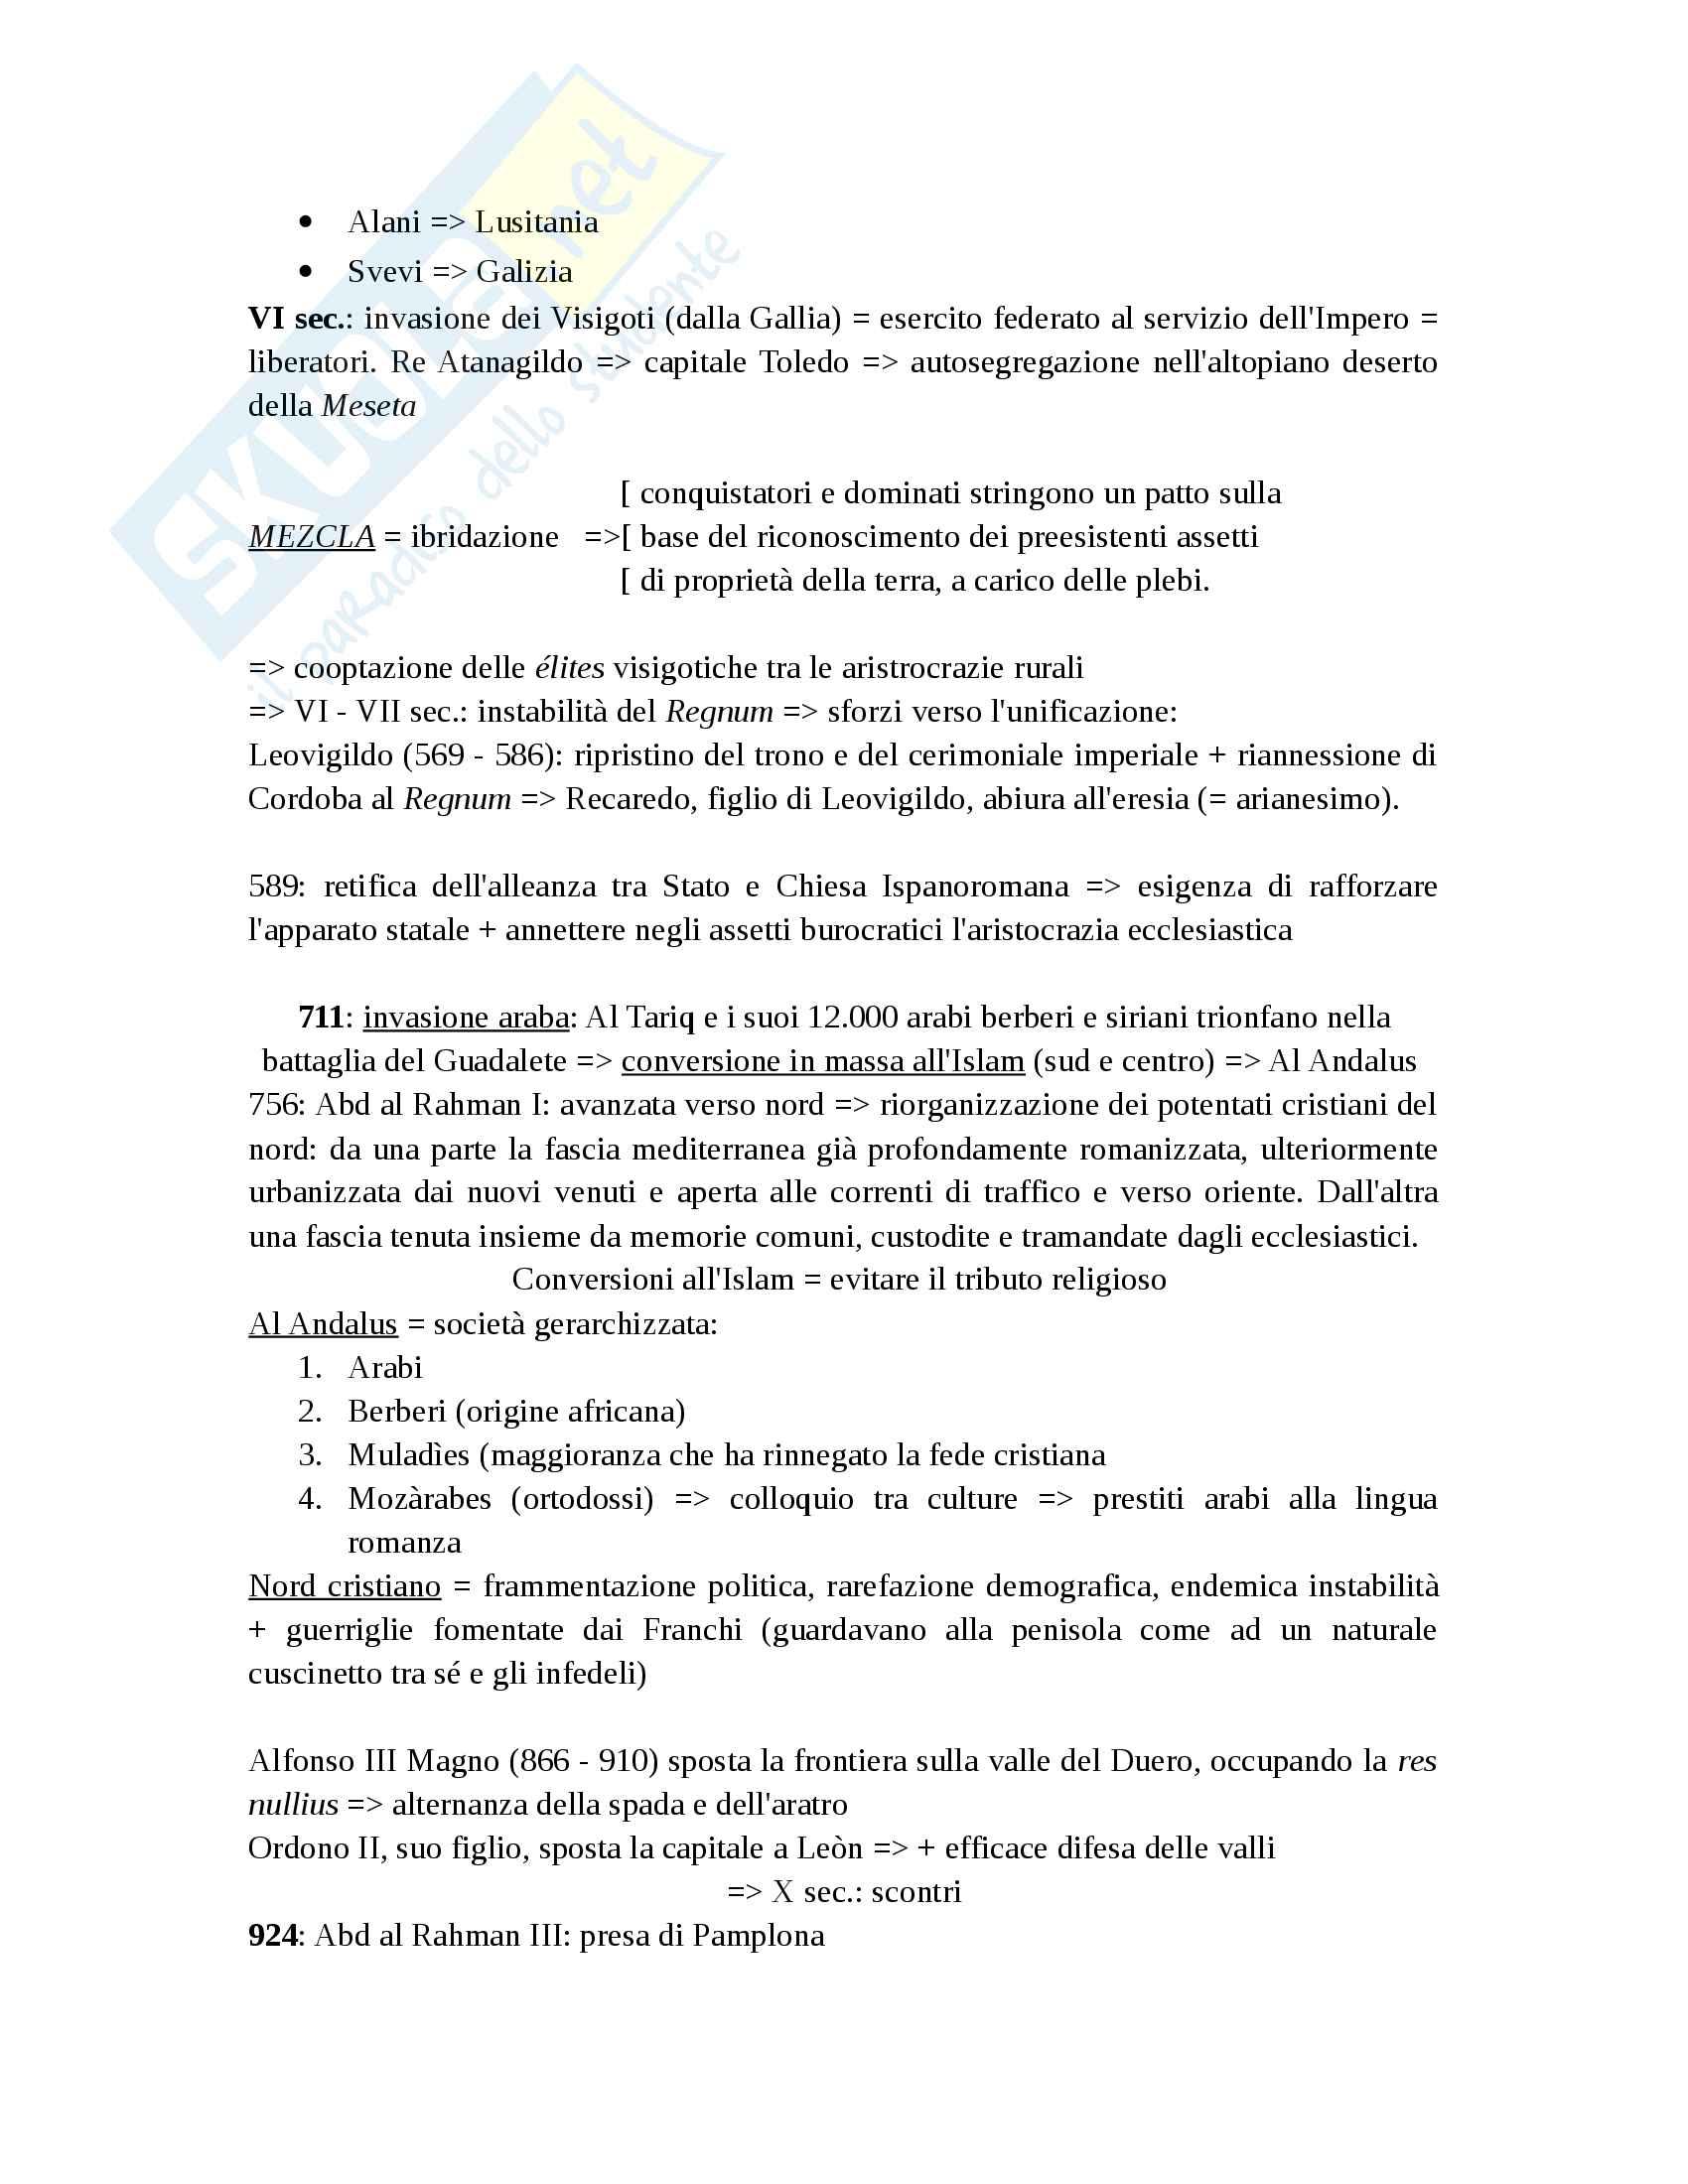 Storia di Spagna (riassunto schematico) Pag. 2